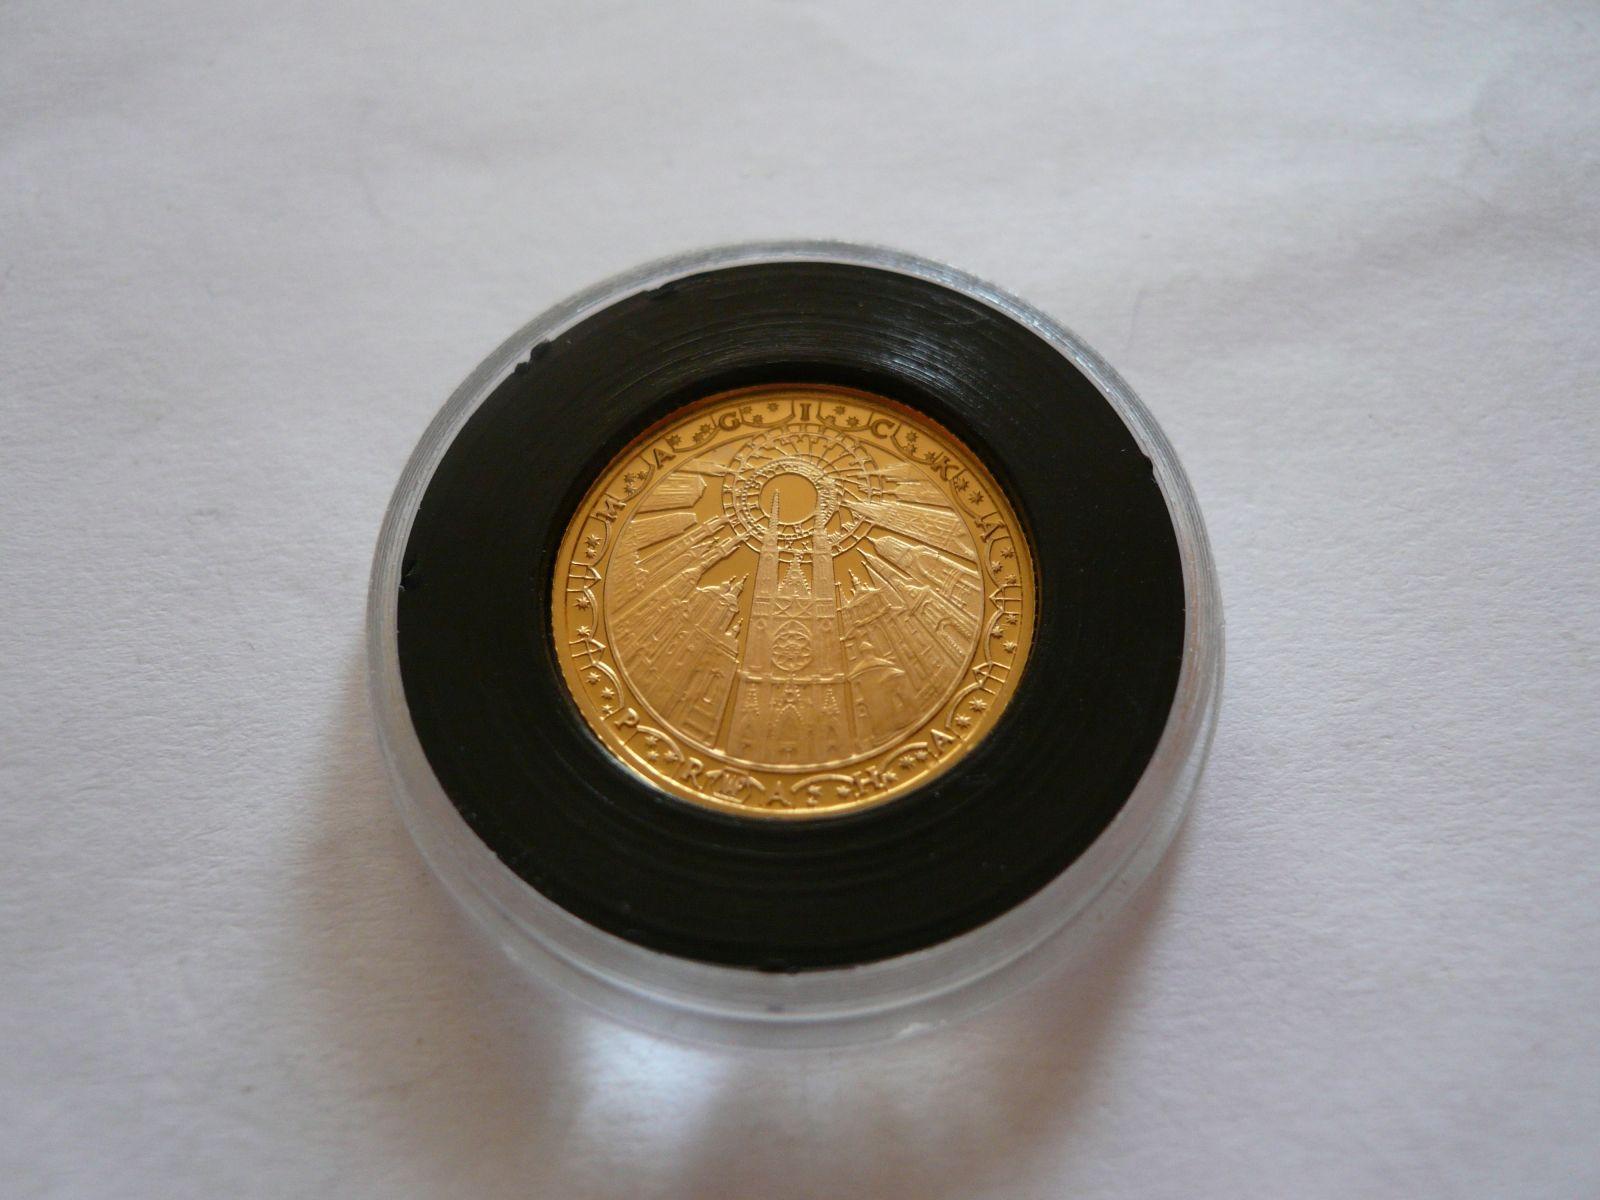 Au medaile Karlův most, bez letopočtu, průměr 18 mm, au 585, 2,05g, ČR